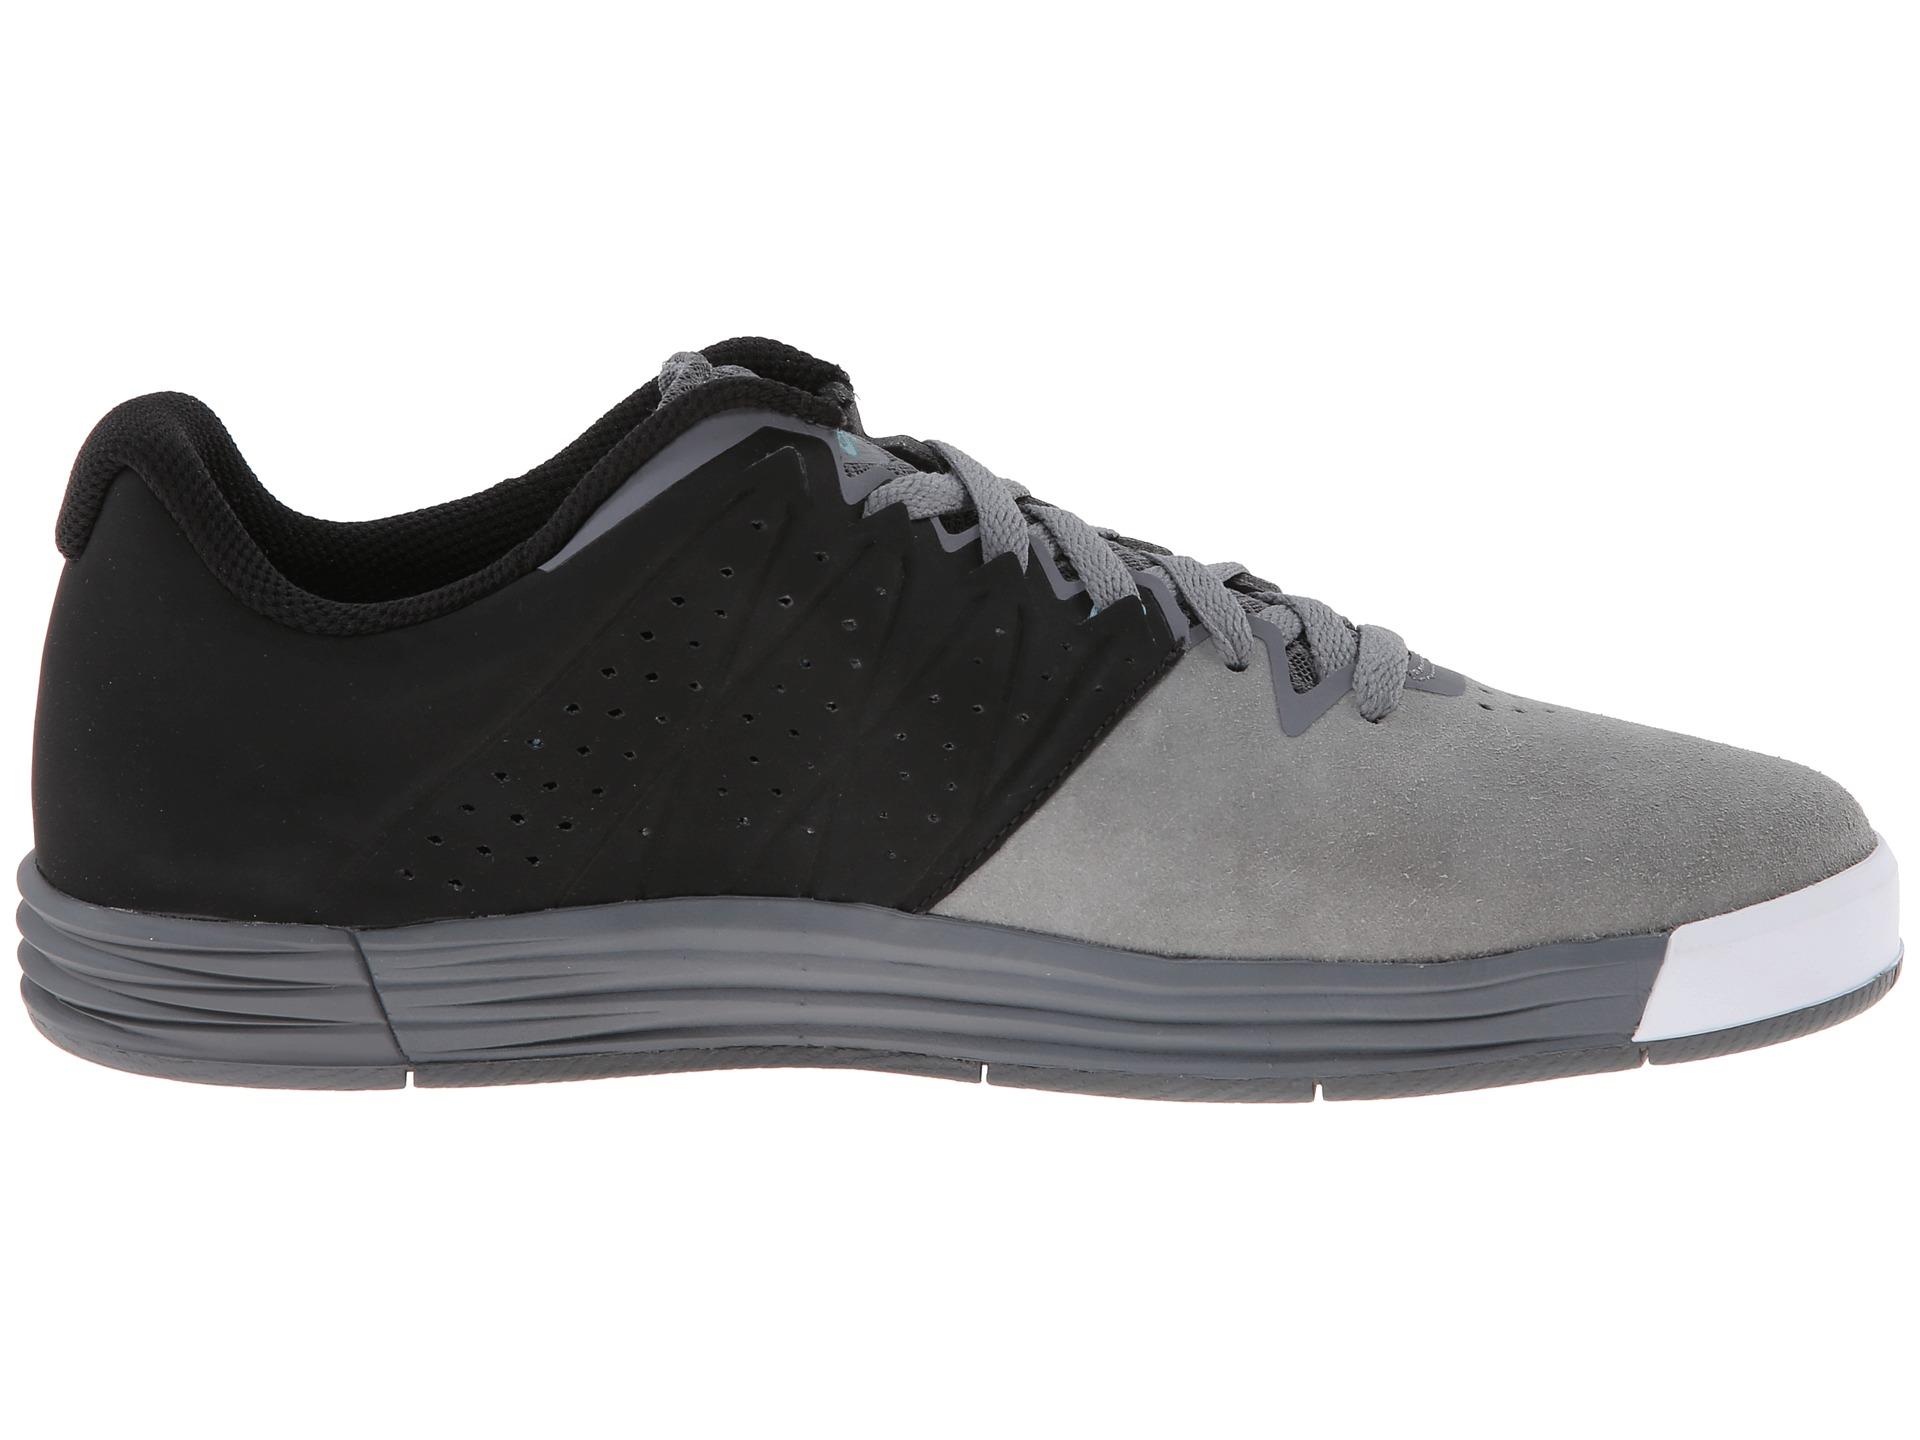 nike skate shoes for women nike sb paul rodriguez citadel